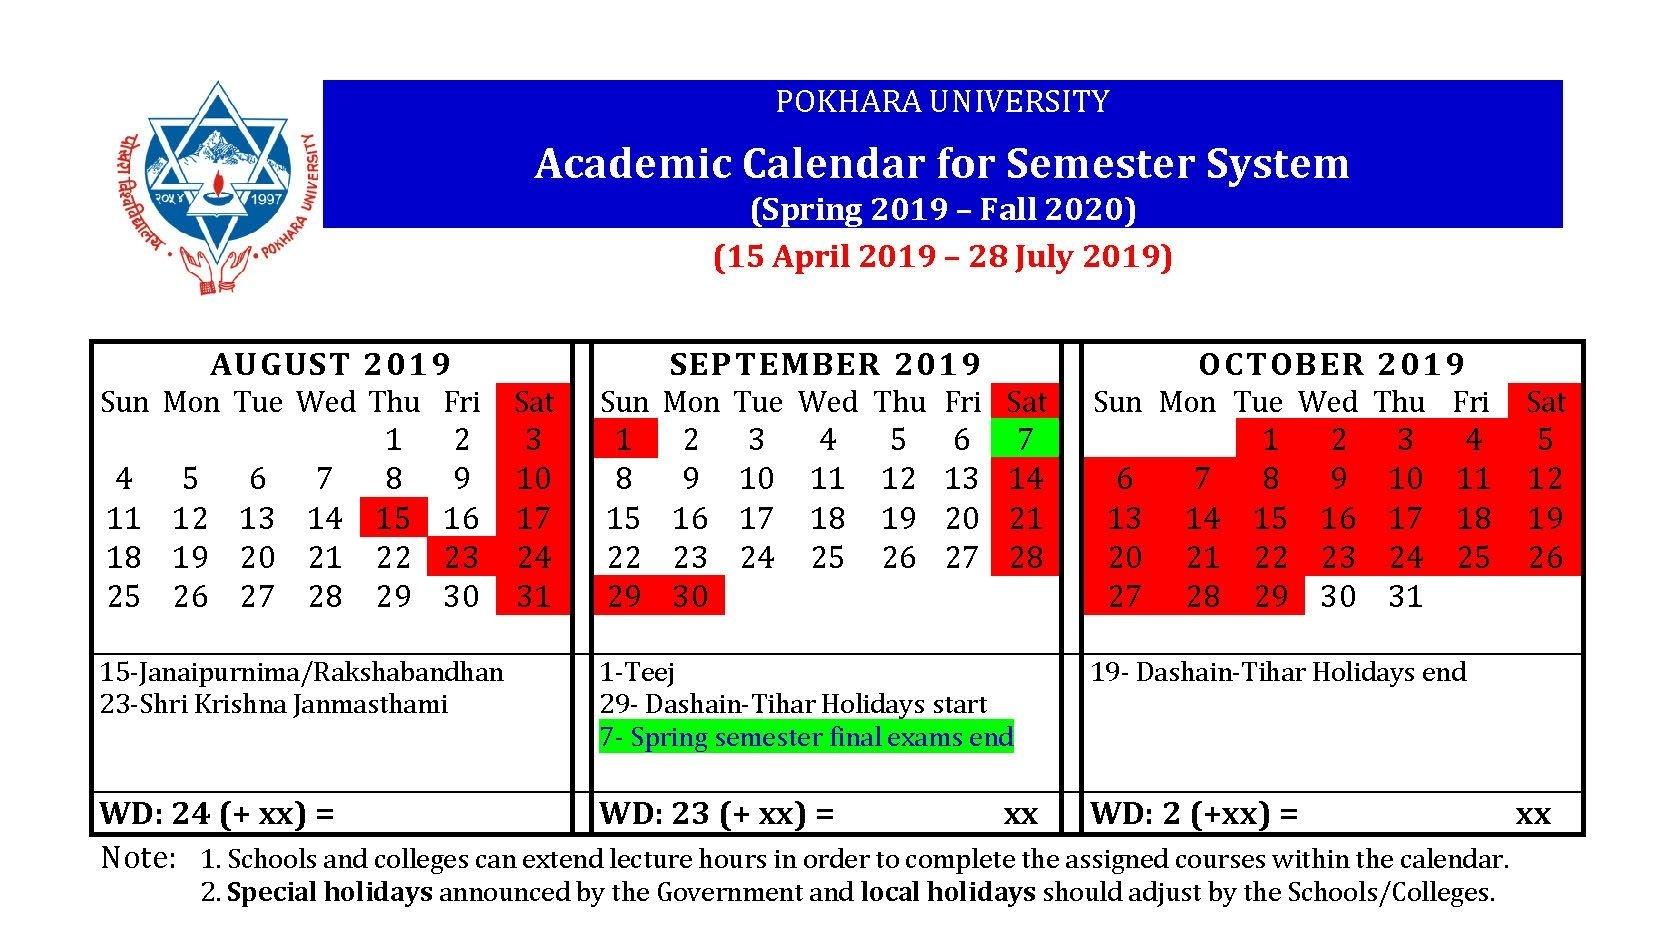 Uc Academic Calendar 2019 20 with Uc Berkeley 2019-2020 Academic Calendar